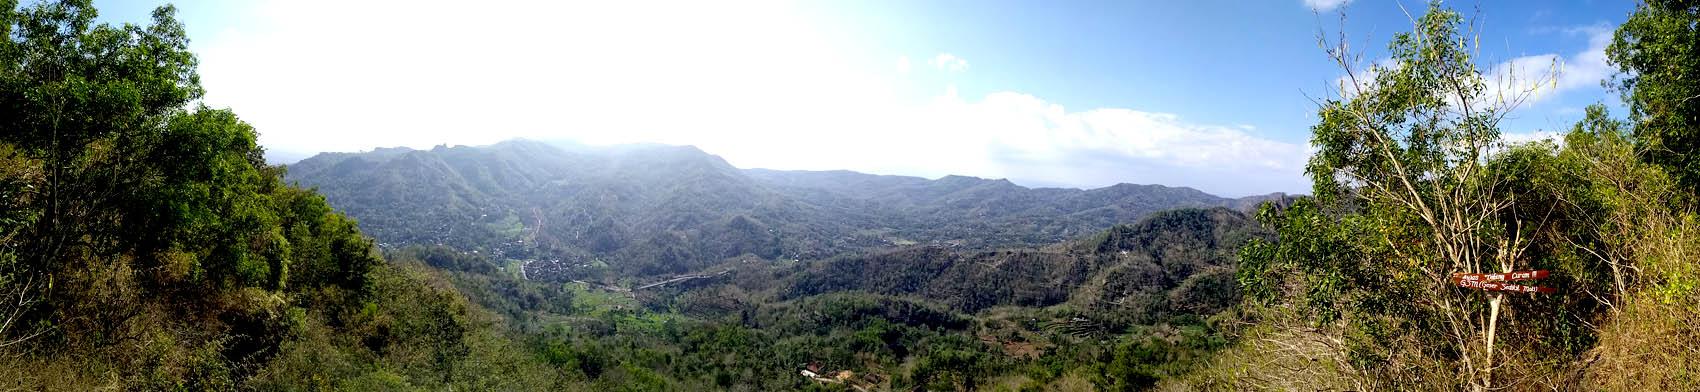 Pemandangan dari Puncak Gunung Keruk